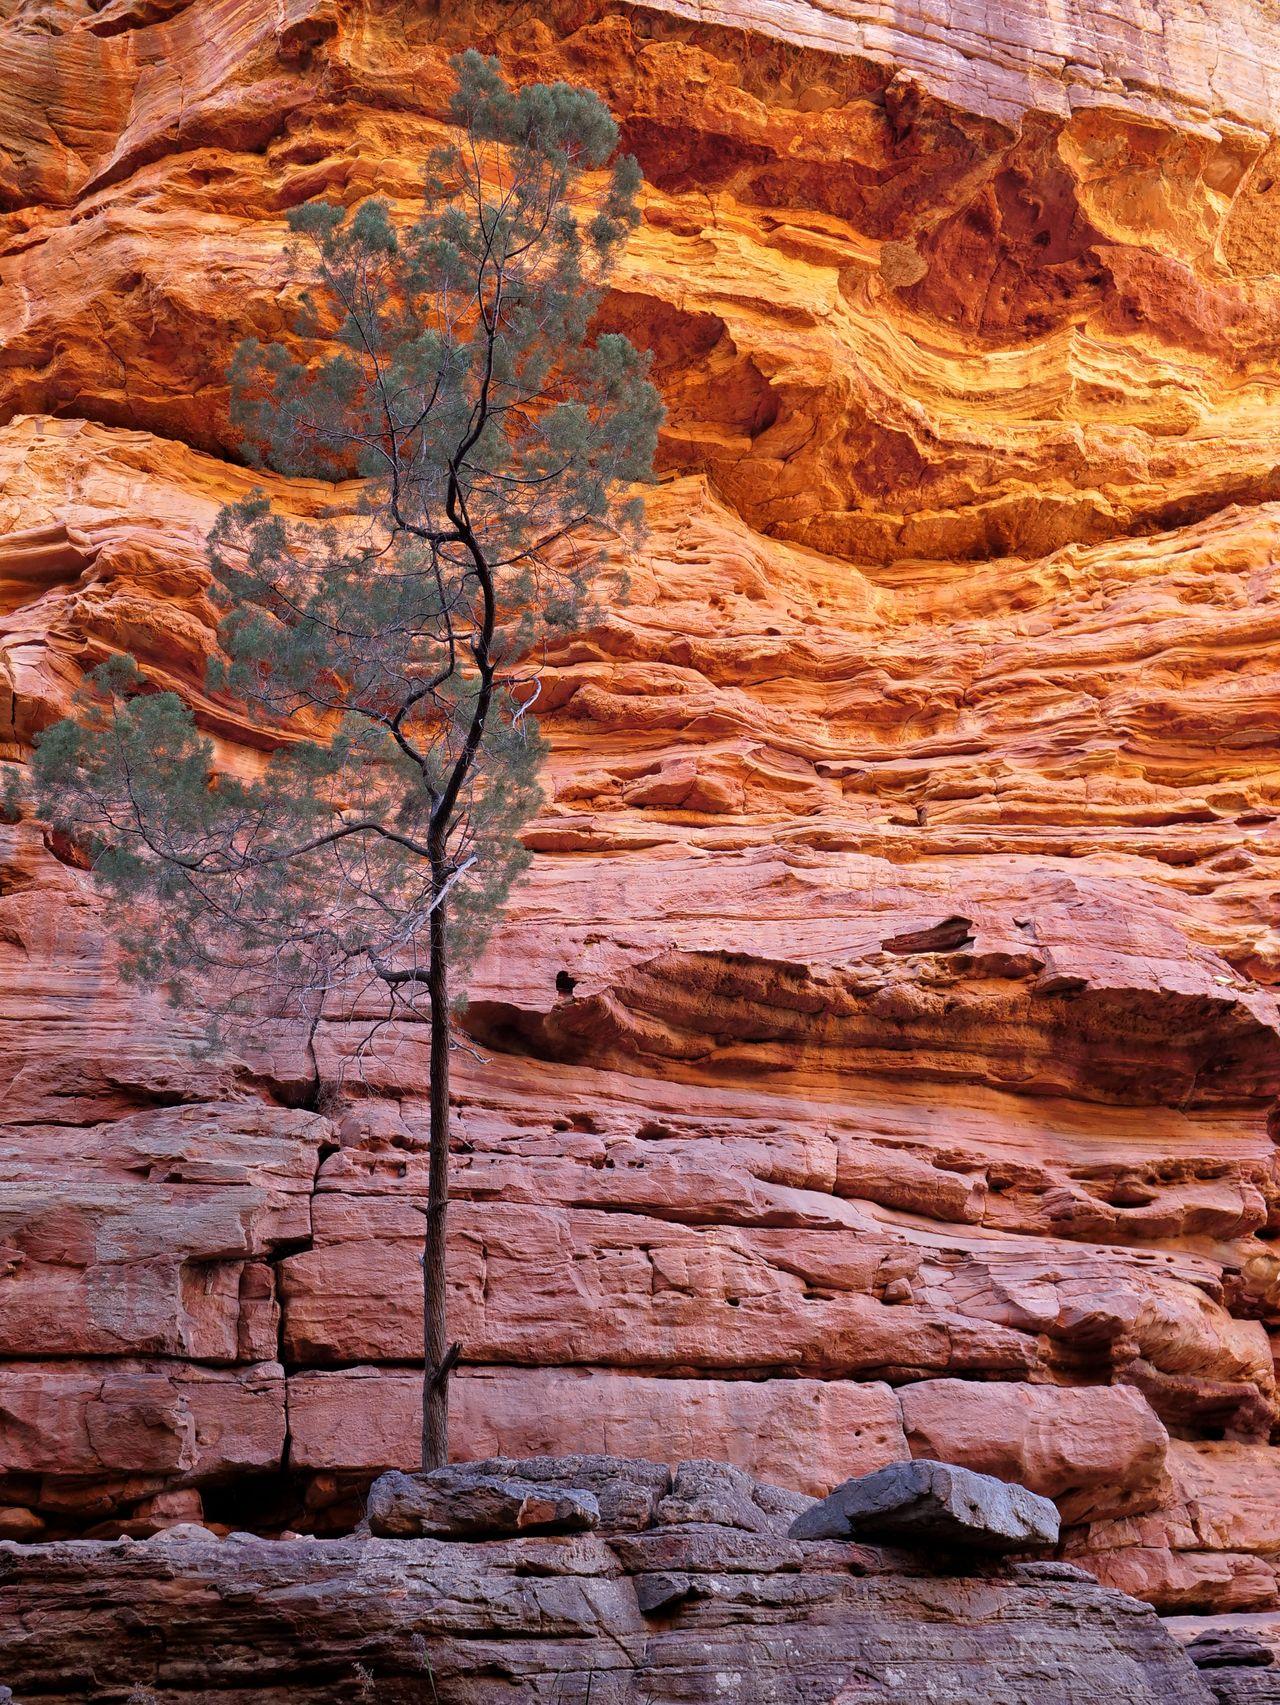 rock, rock - object, rock formation, solid, geology